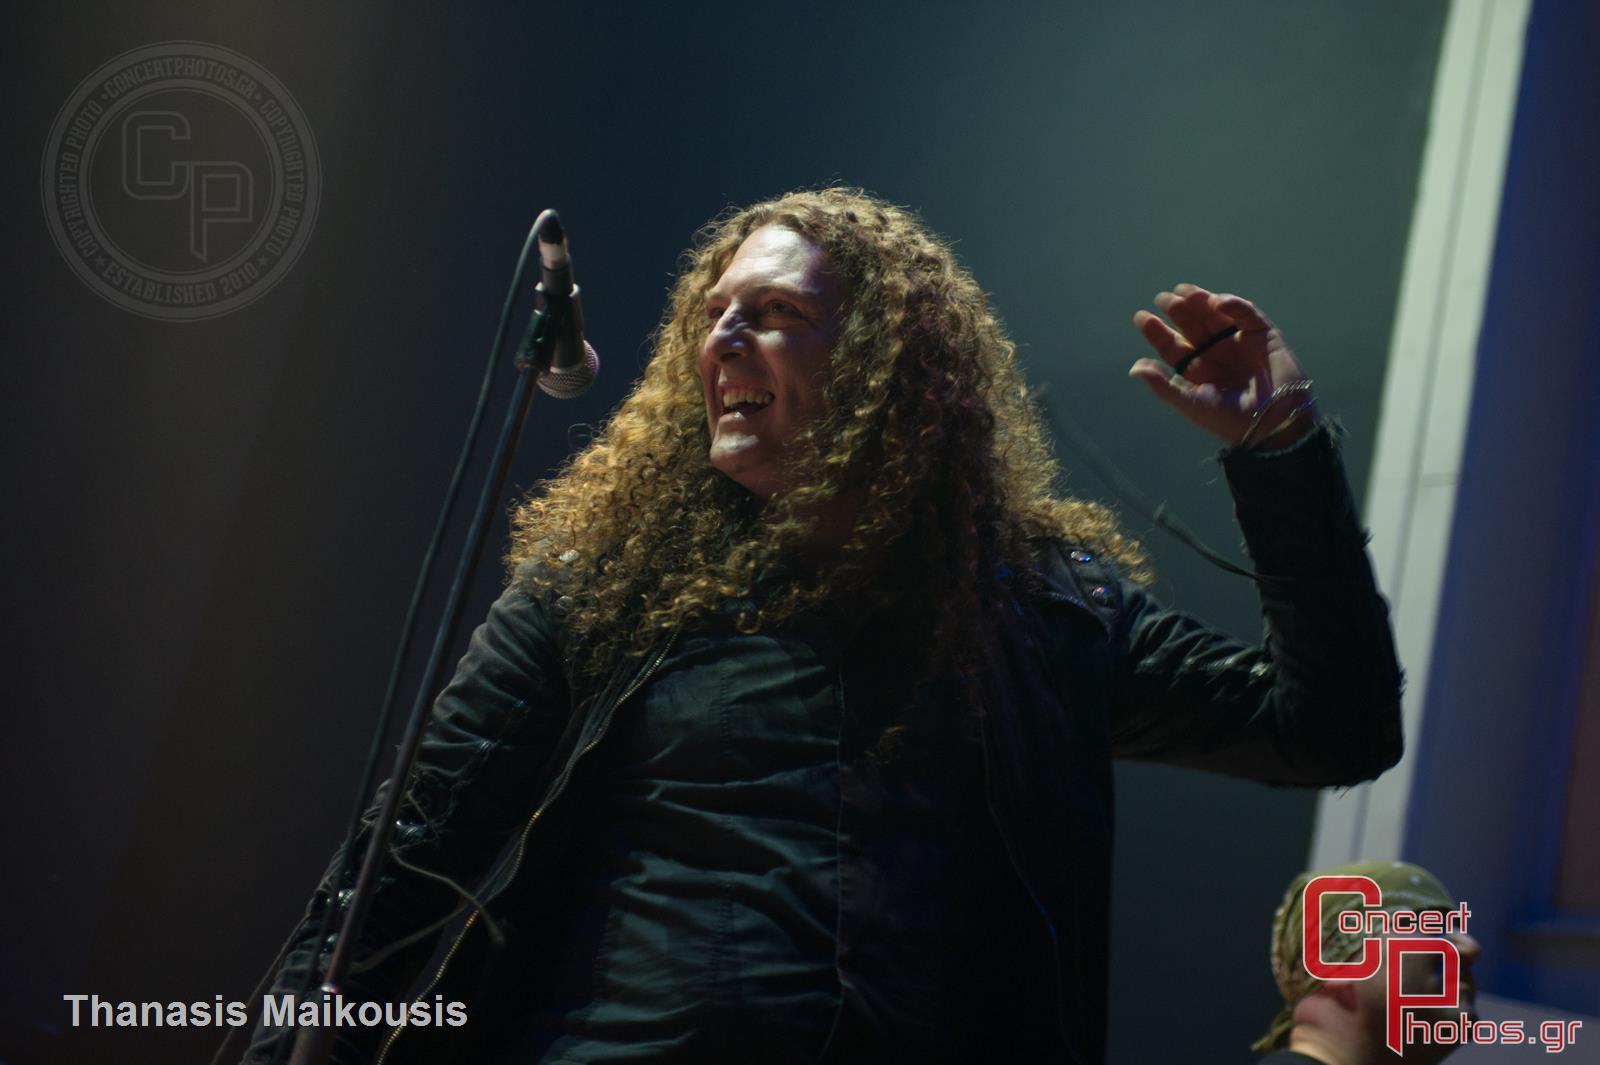 Gamma Ray + Rhapsody Of Fire-Gamma Ray Rhapsody Of Fire photographer: Thanasis Maikousis - _DSC1095